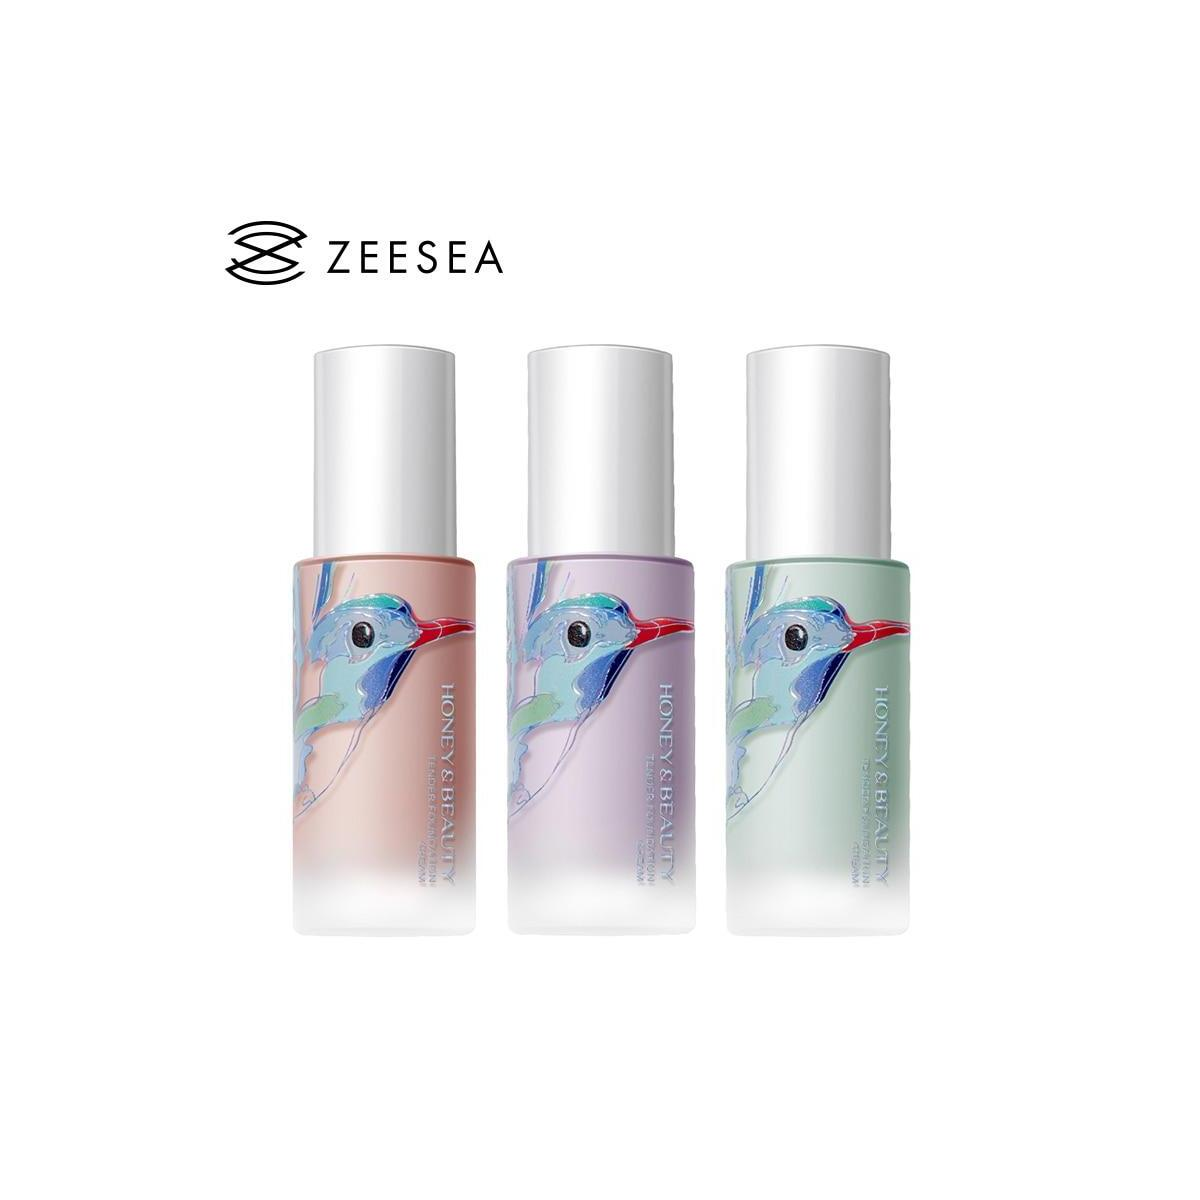 ZEESEA New Makeup Base Face Liquid Foundation, N03